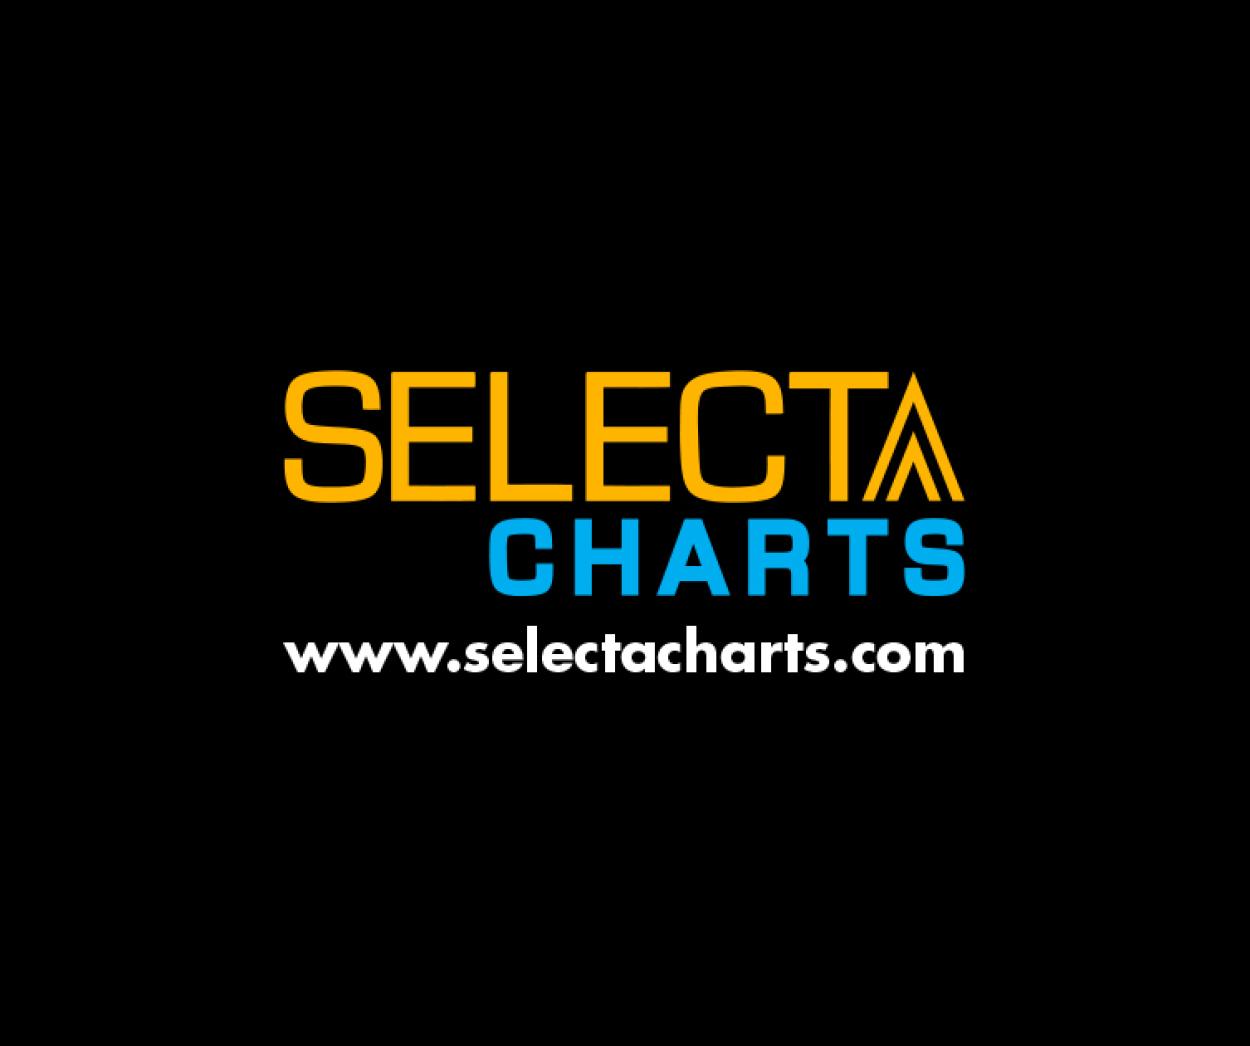 Selecta-Charts-Website-Ad2.jpg